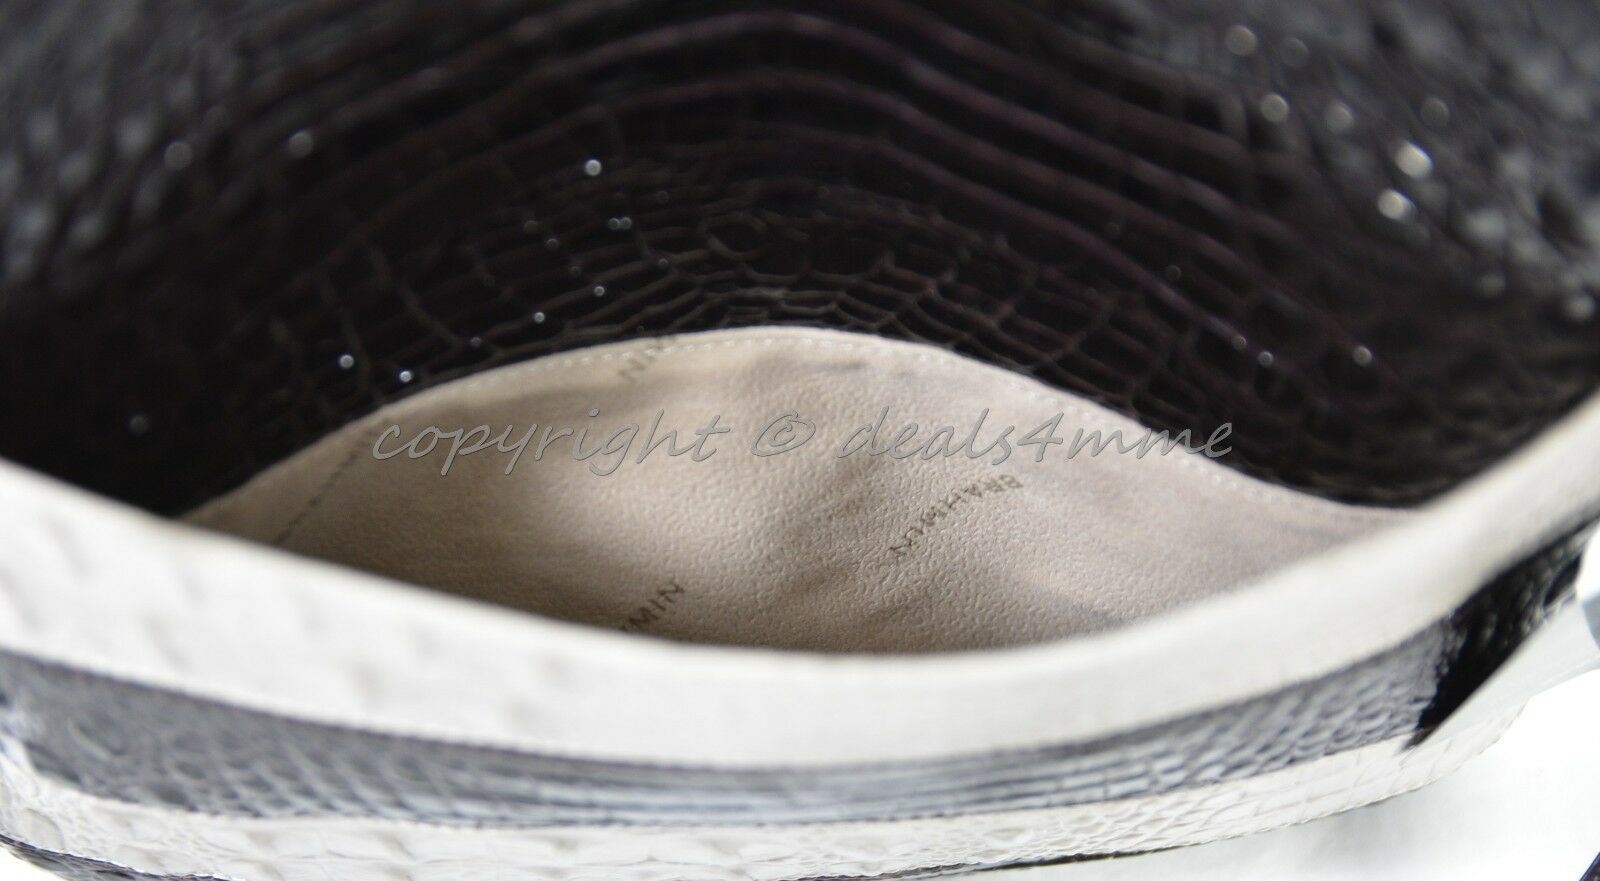 NWT Brahmin Jody Striped Cross-Body/Shoulder Bag in Angora Vineyard image 11